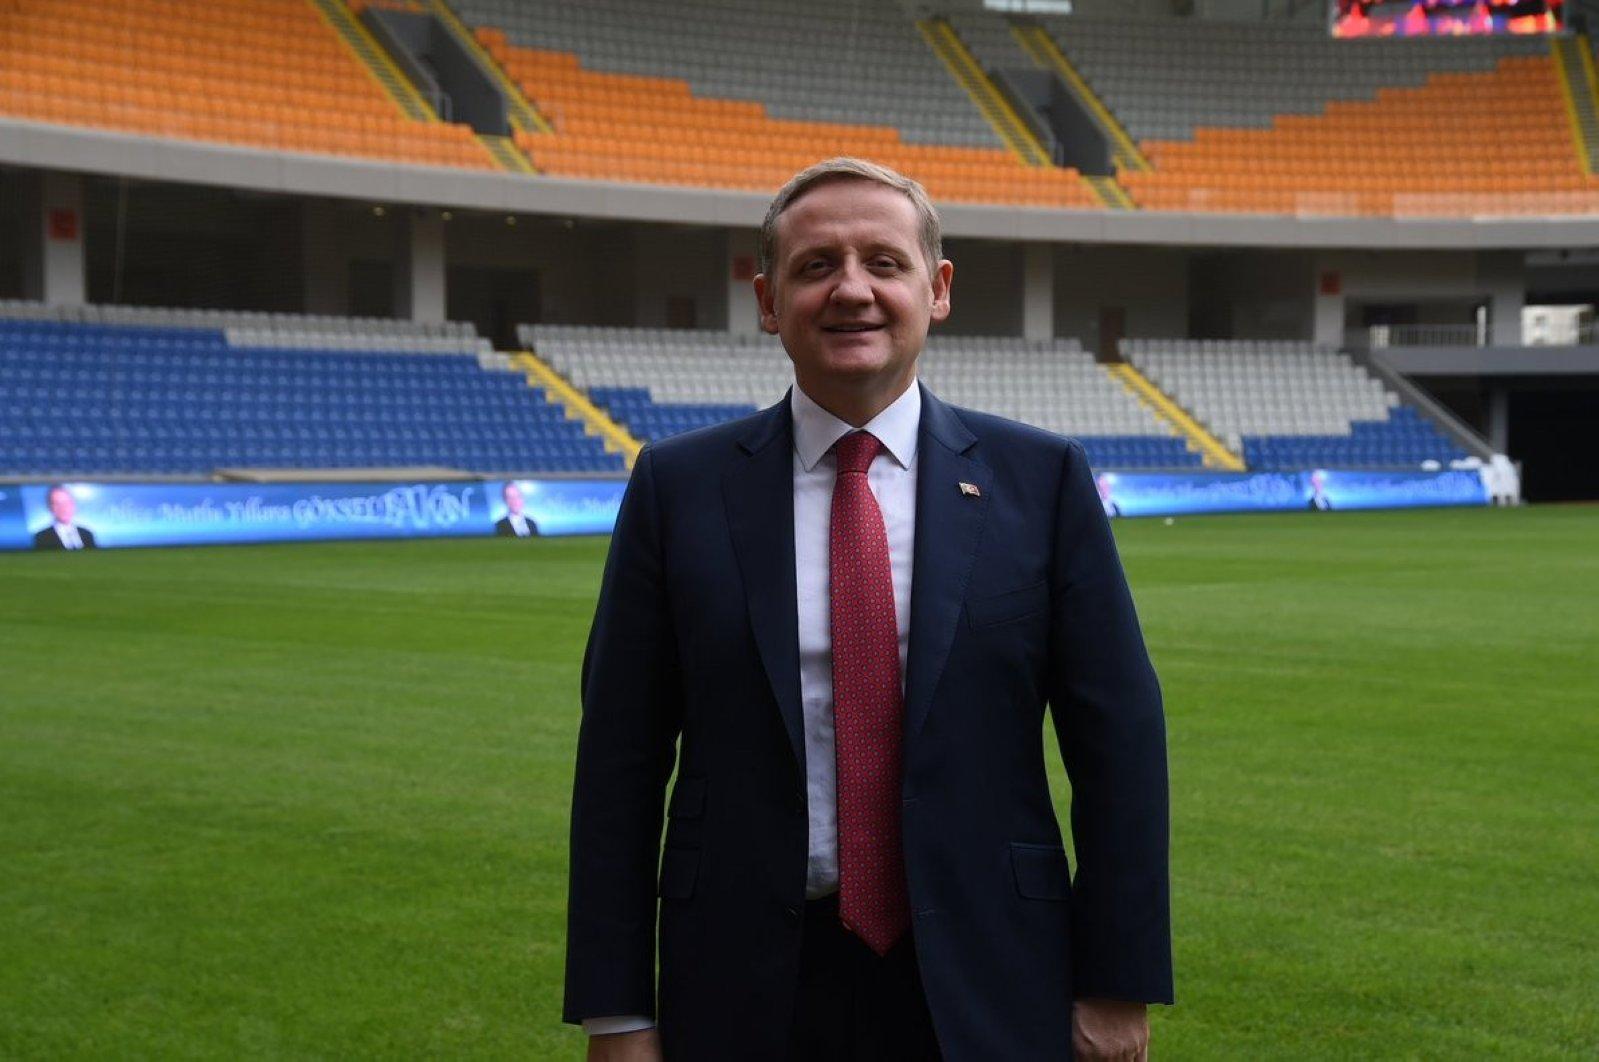 Göksel Gümüşdağ is seen in a stadium in Istanbul, Turkey in this undated photo. (İHA Photo)